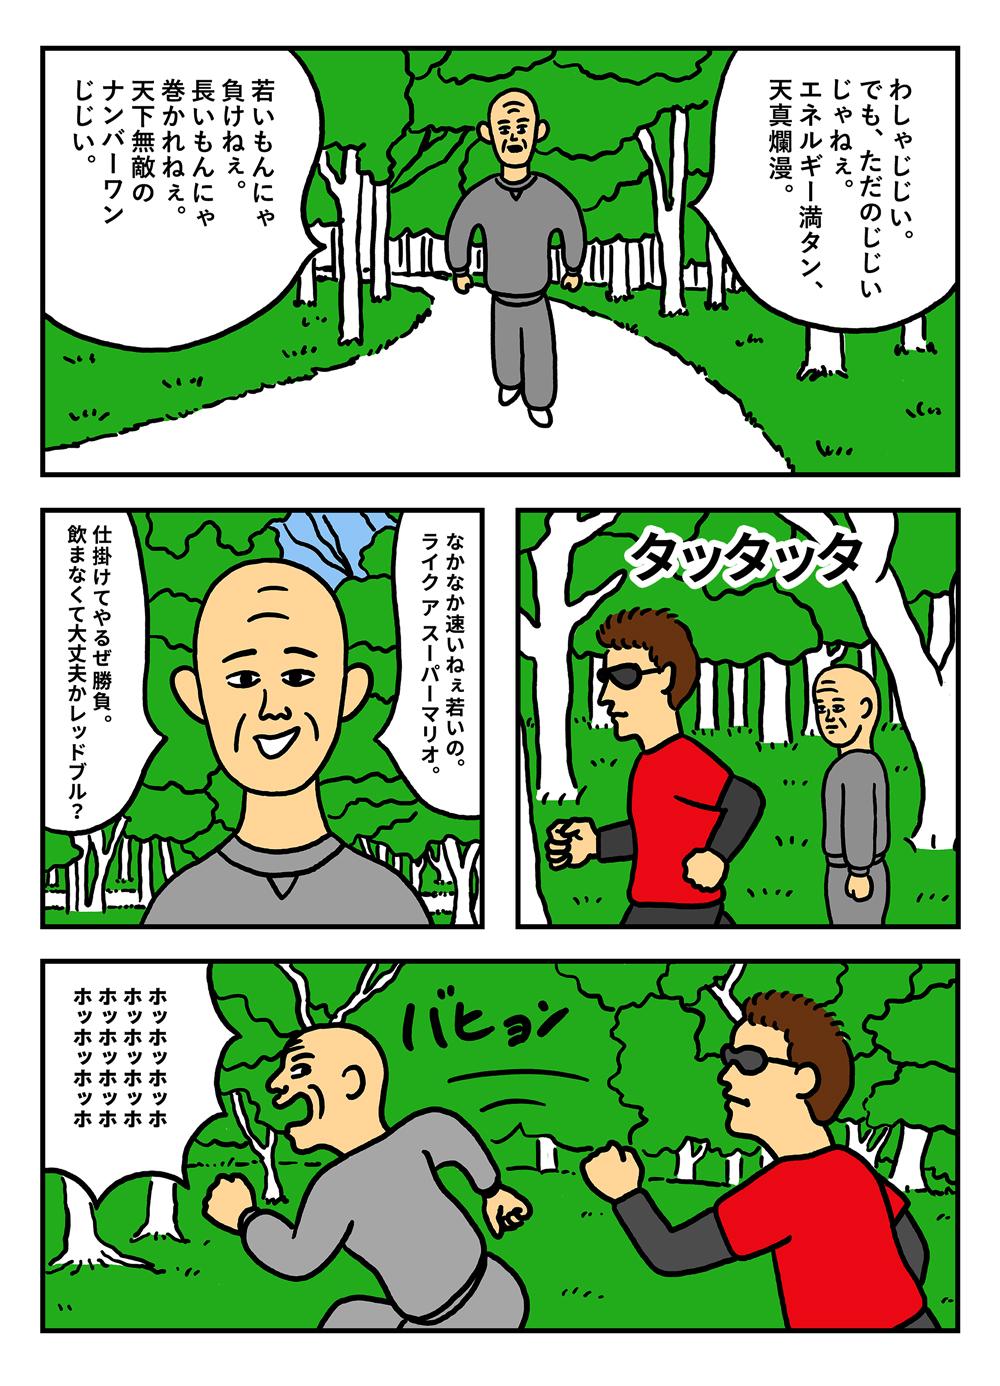 himuro-001-1